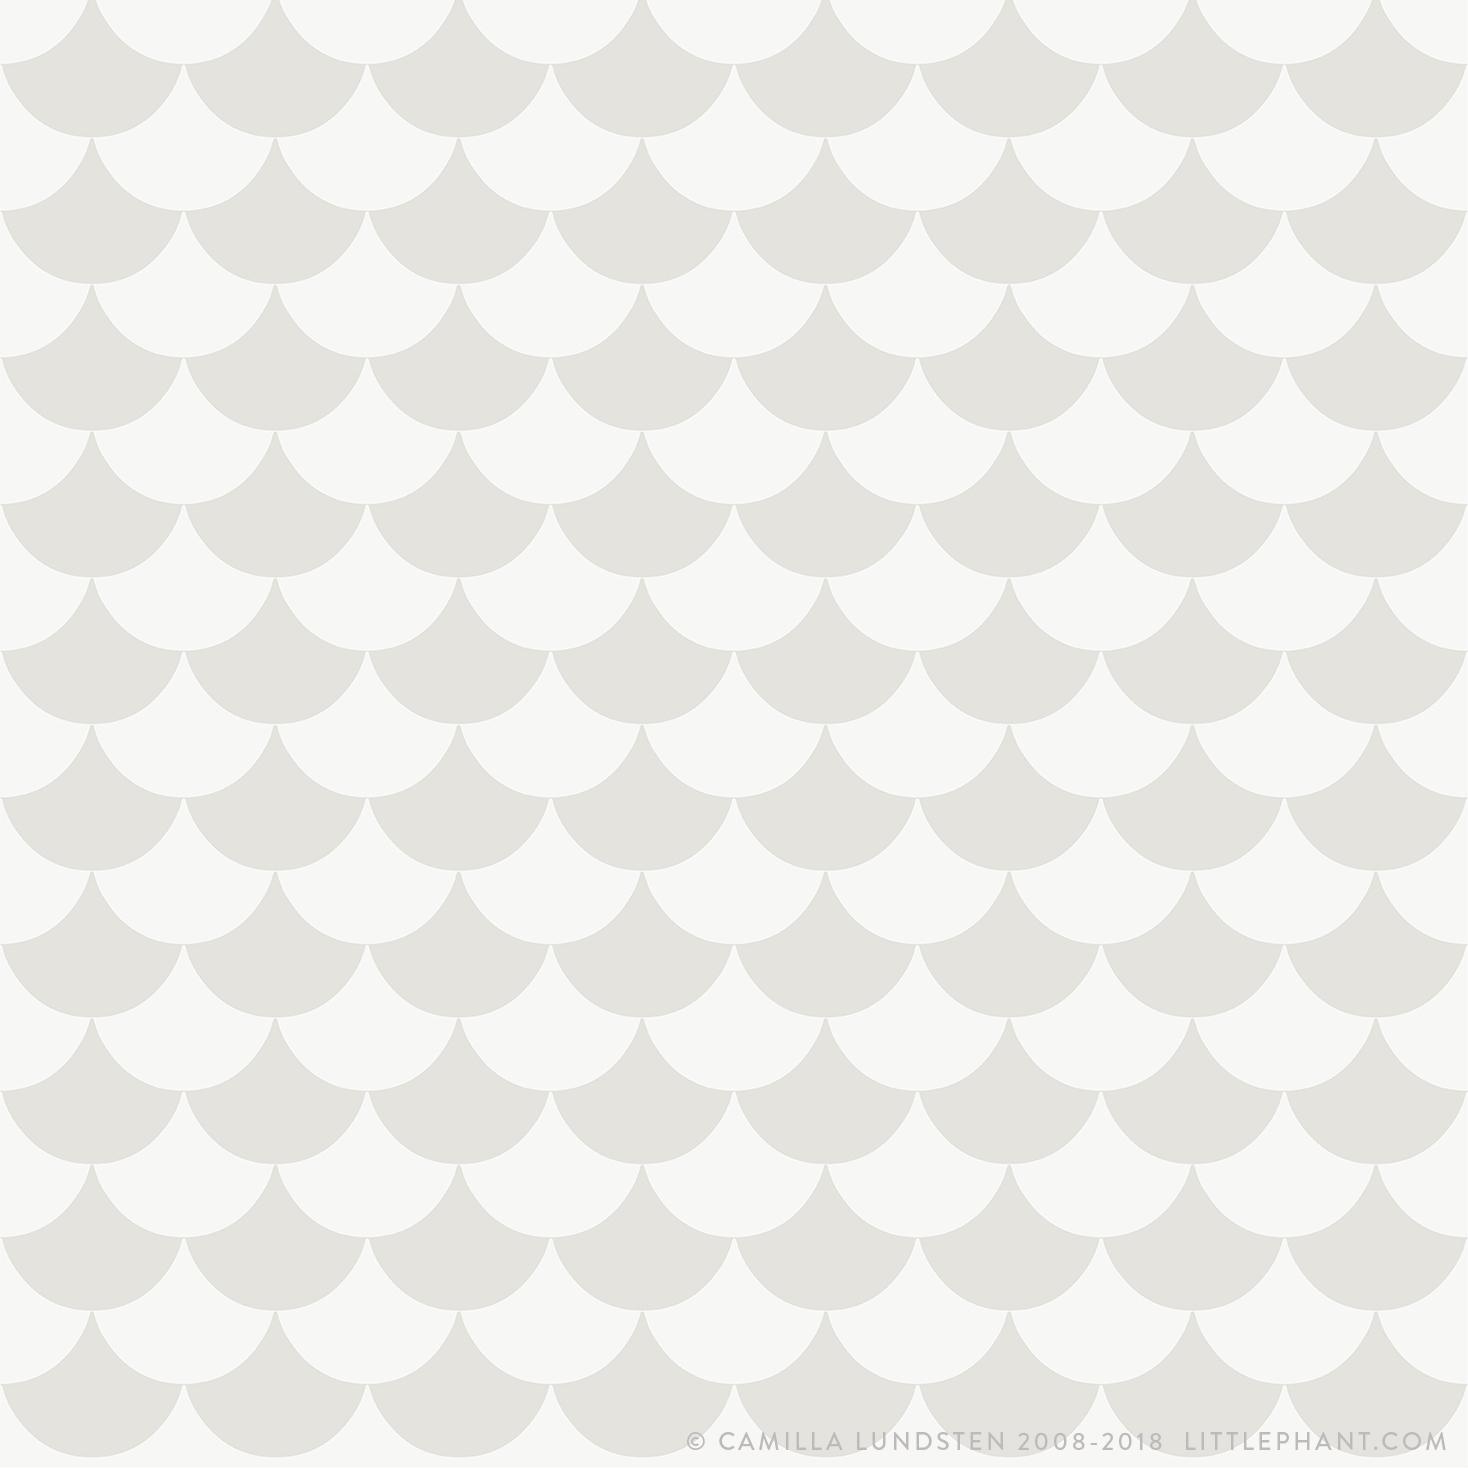 Tapet Waves - Light grey, Littlephant